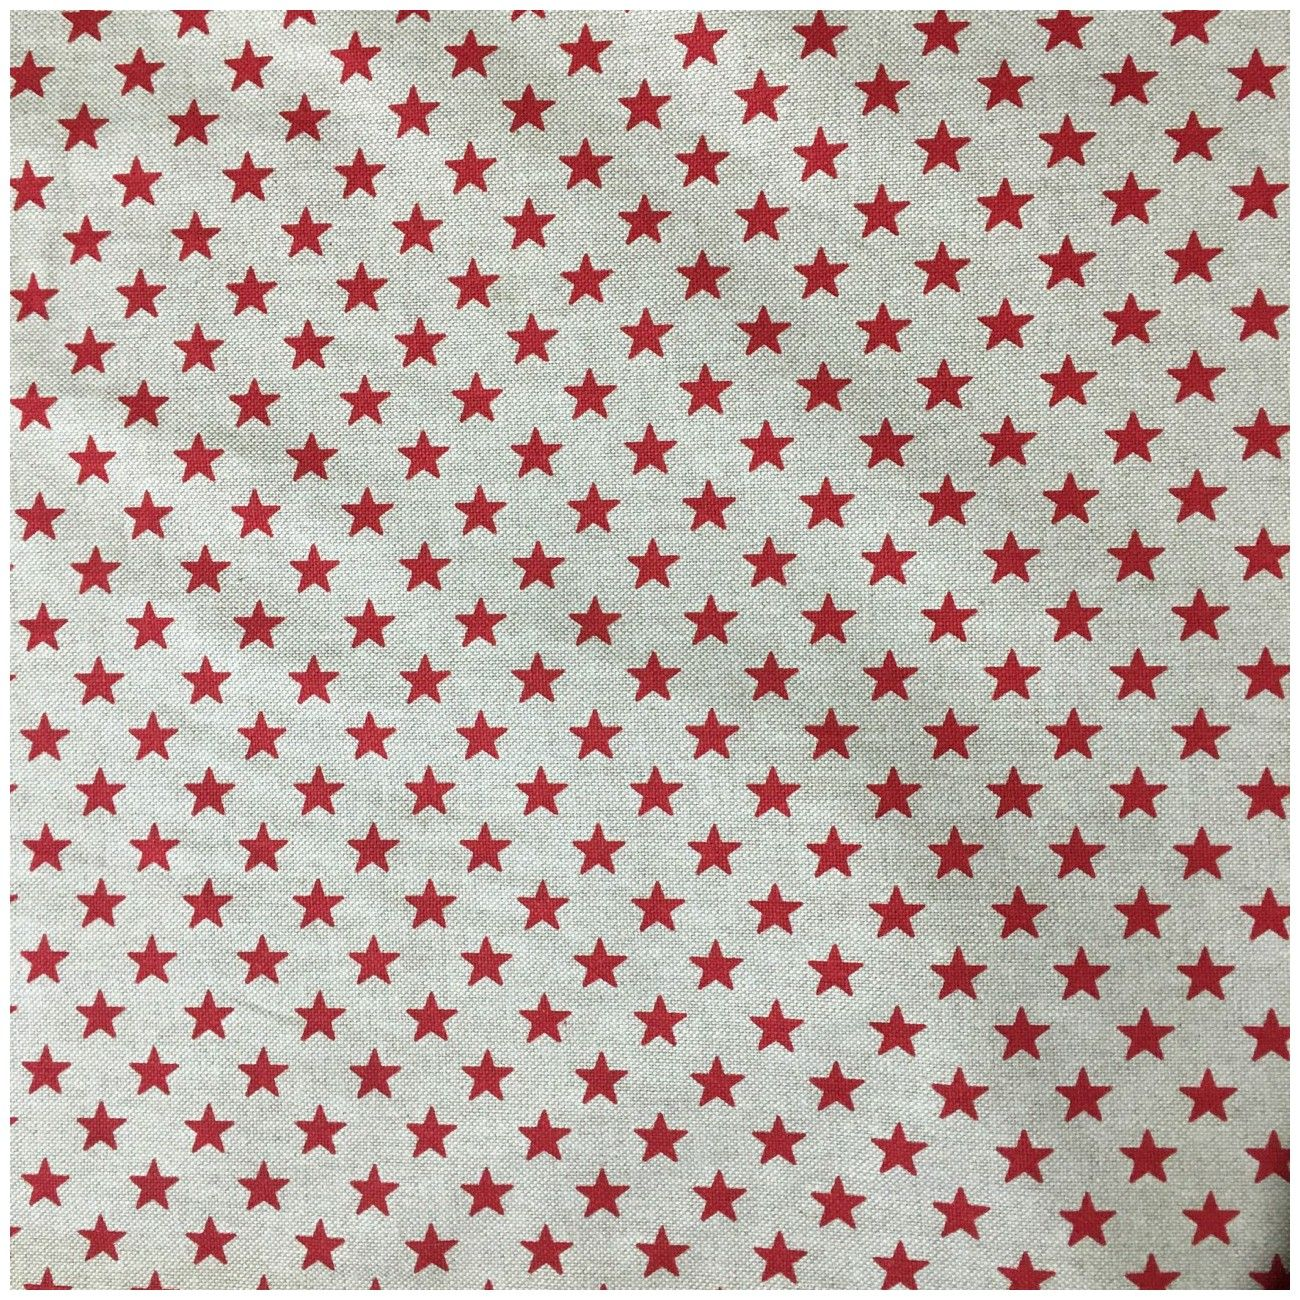 Tissu toile coton étoiles rouge